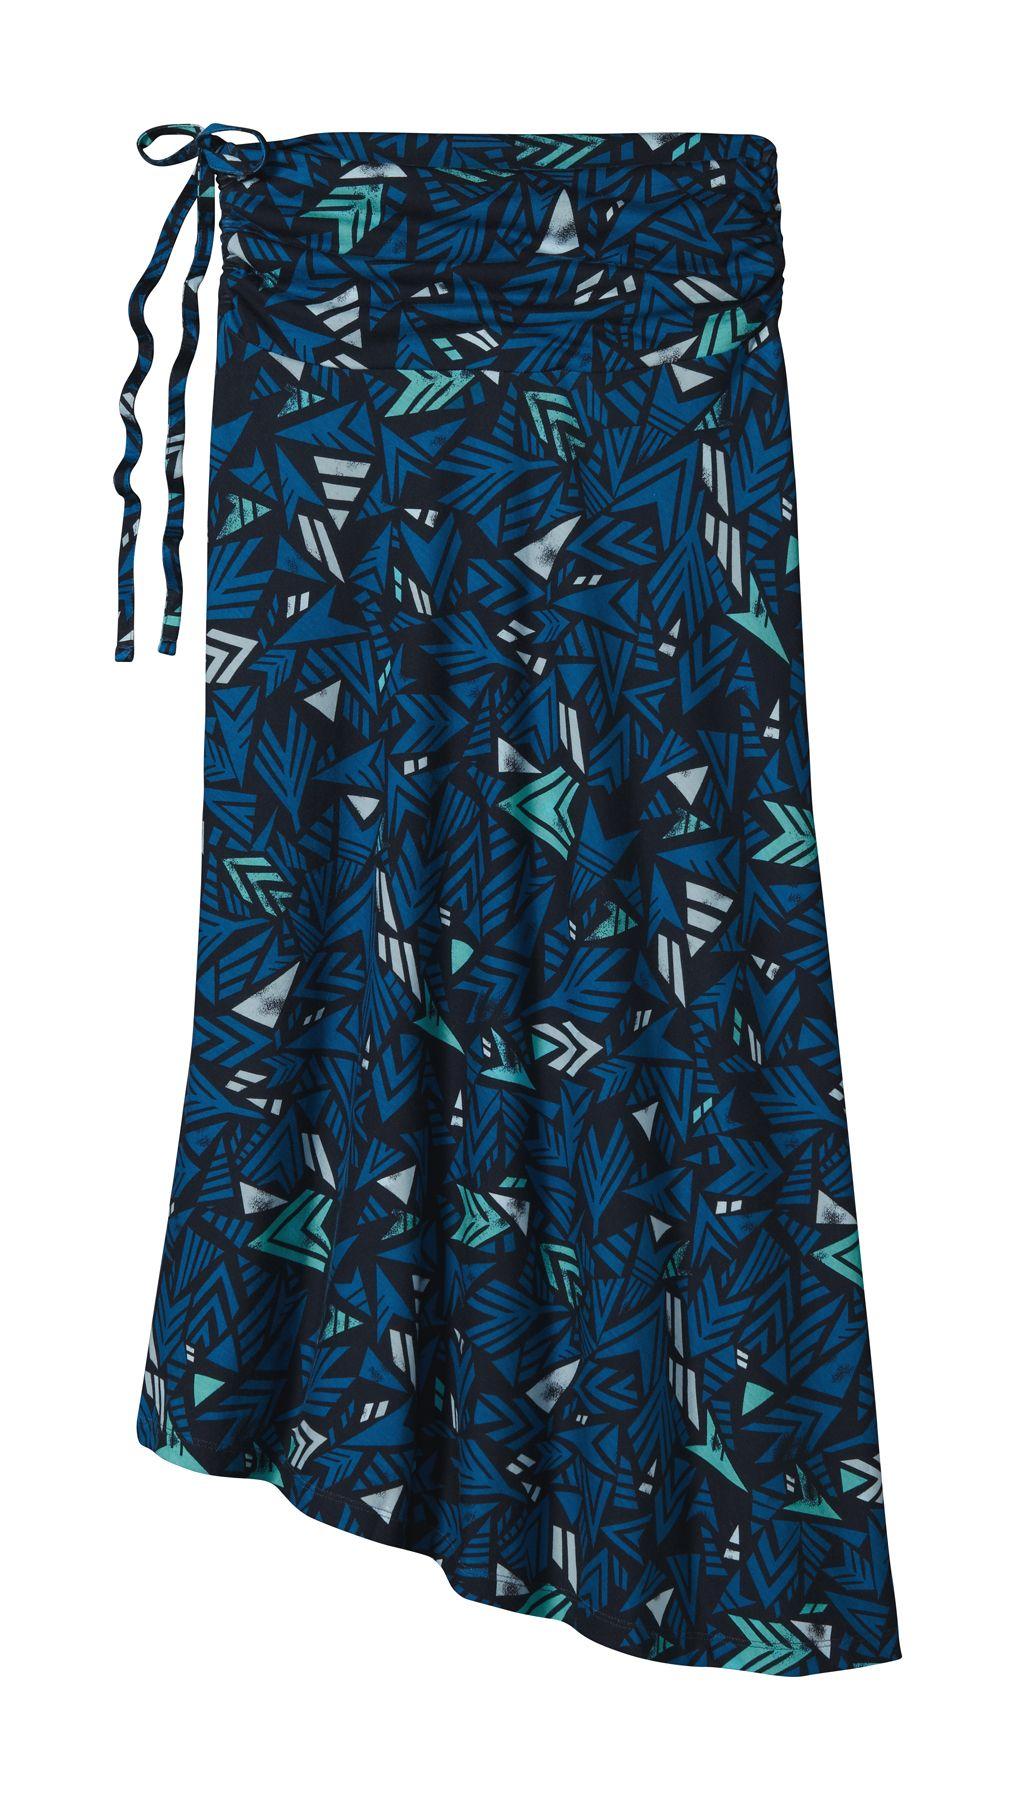 3b28c99557 patagonia Kamala Skirt   Gifts for mom   Pinterest   Skirts, Dresses ...